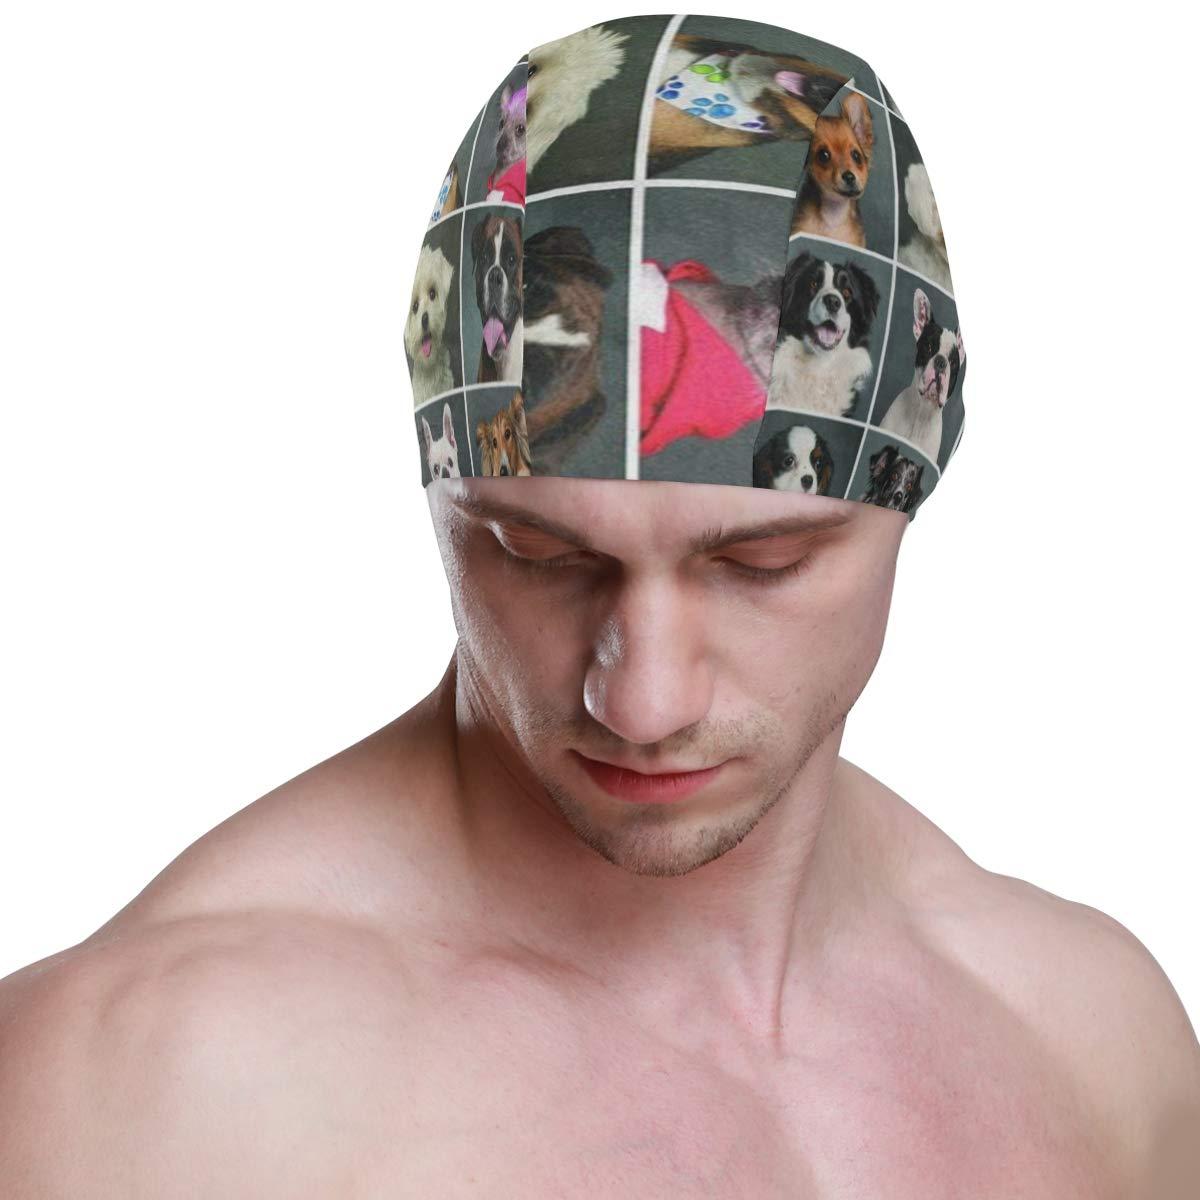 Christmas Foxes Swim Cap Mens Spandex Swimming Bathing Cap Hat Super-Sleek Design//Optimum Comfort//Skin-Friendly//for Short and Long Hair//Extra Durability